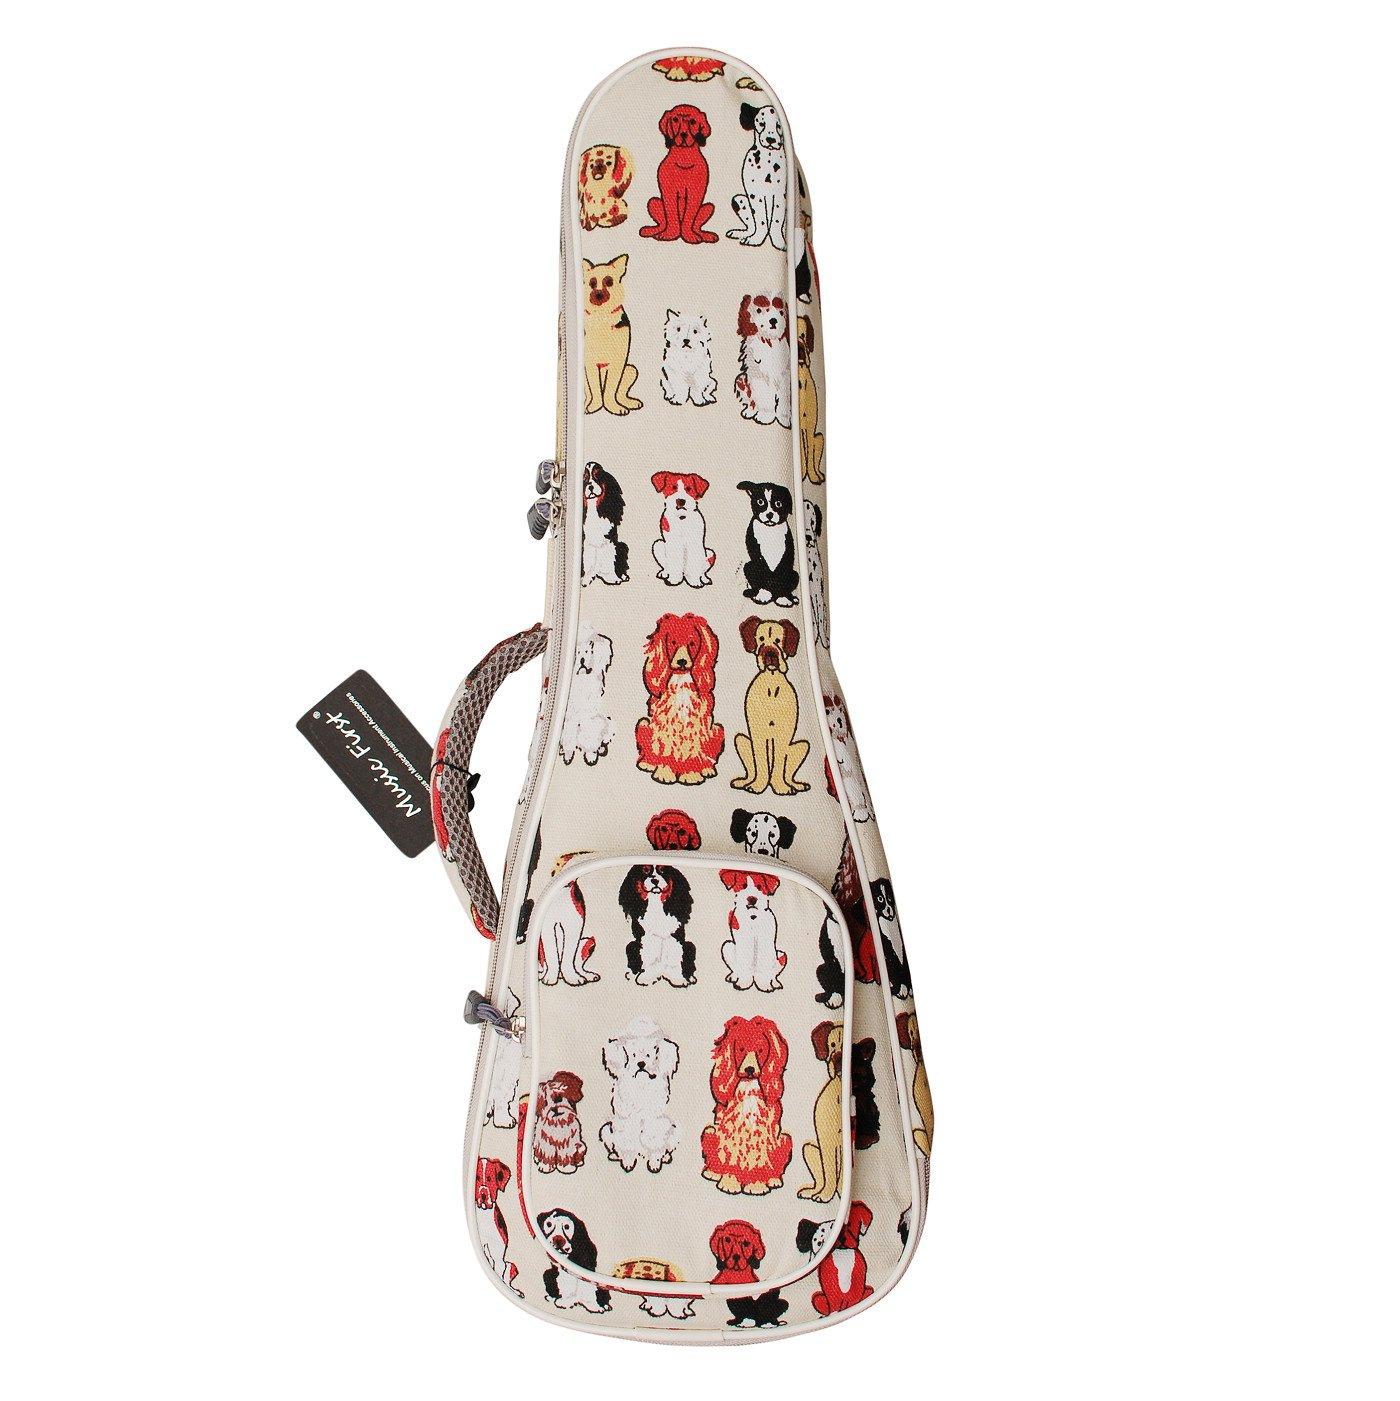 Funda Music First para ukelele dise/ño de gatos de algod/ón